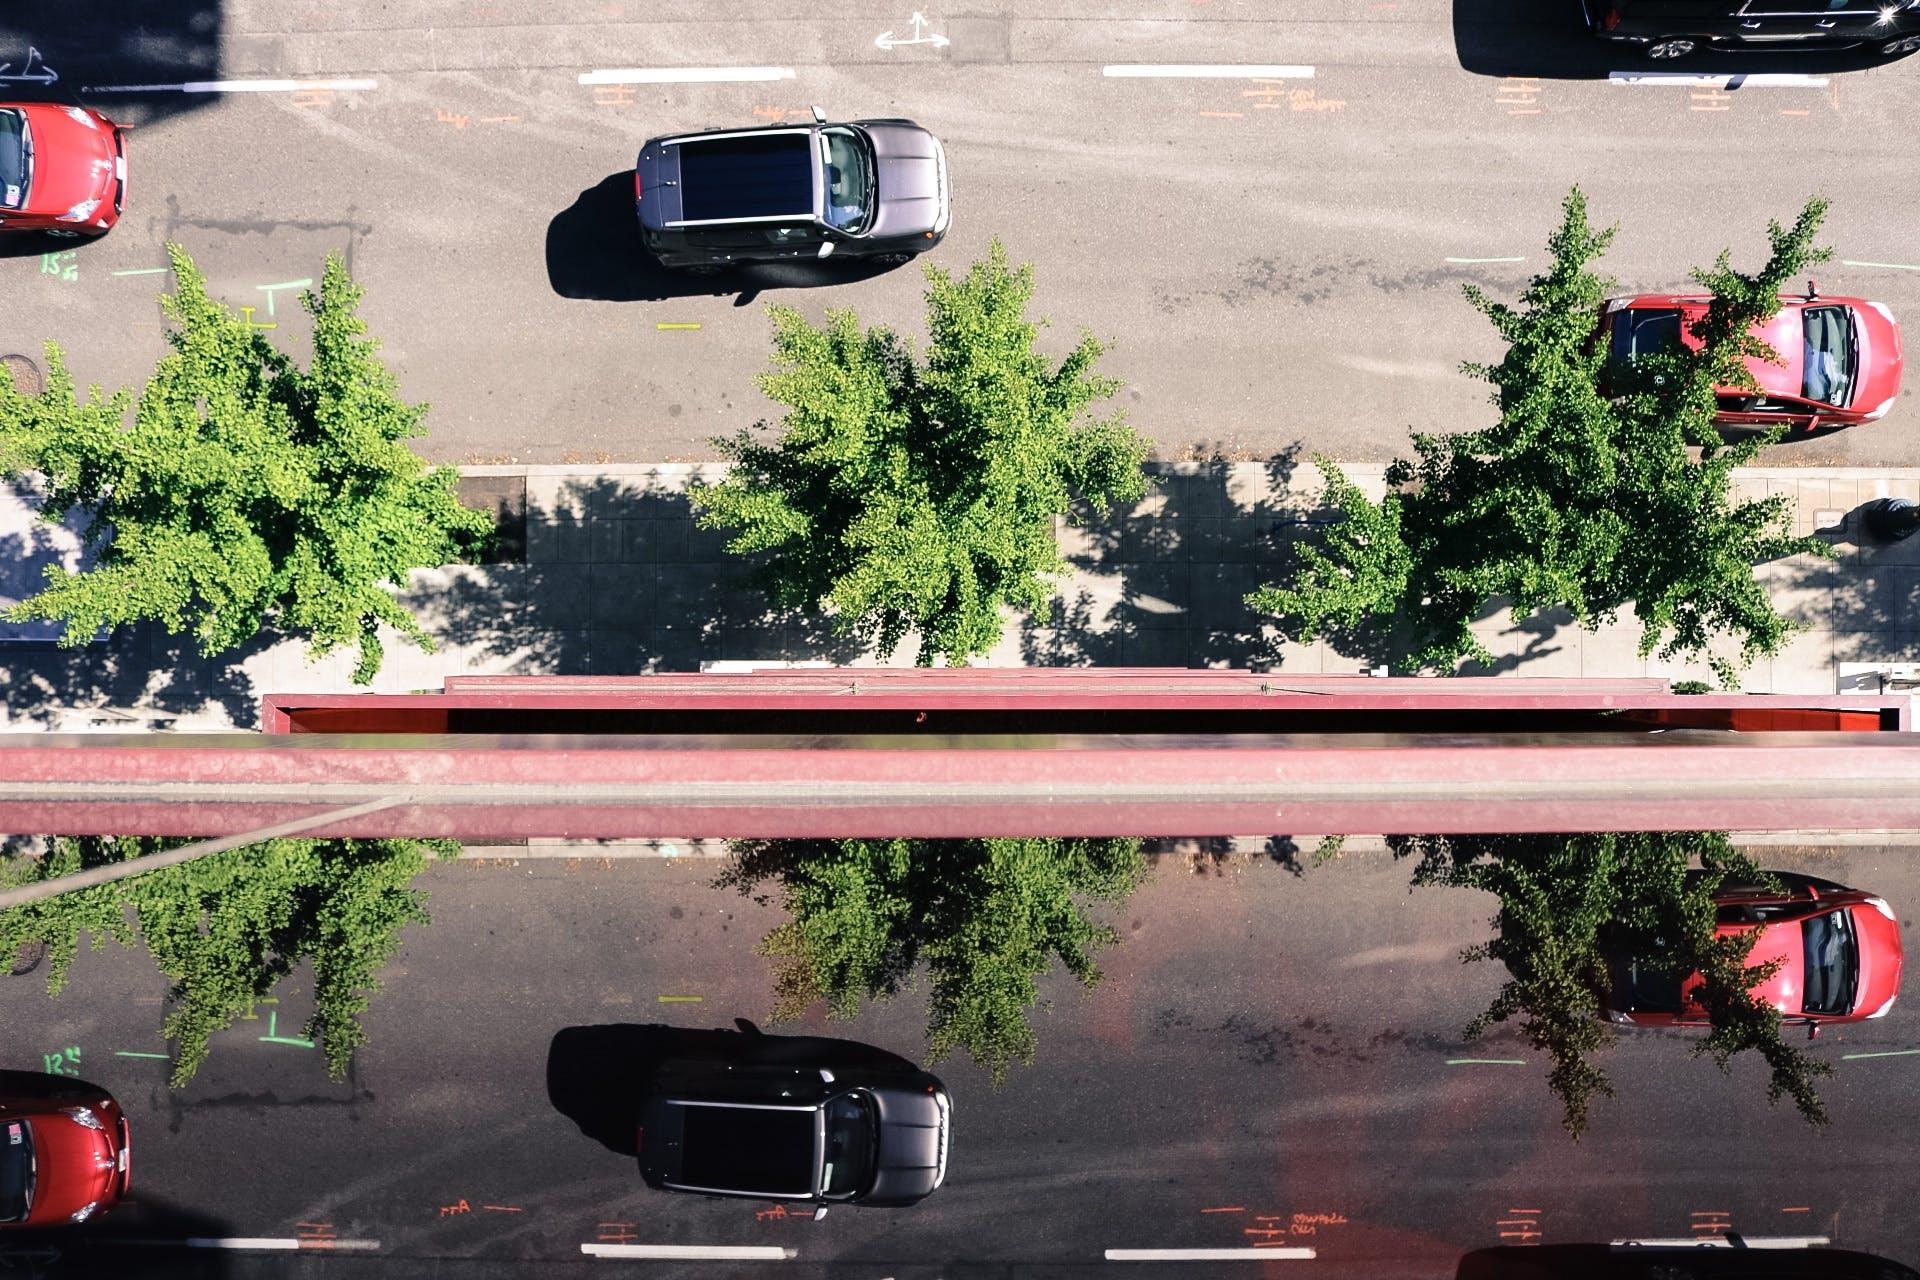 Free stock photo of cars, street, sidewalk, trees